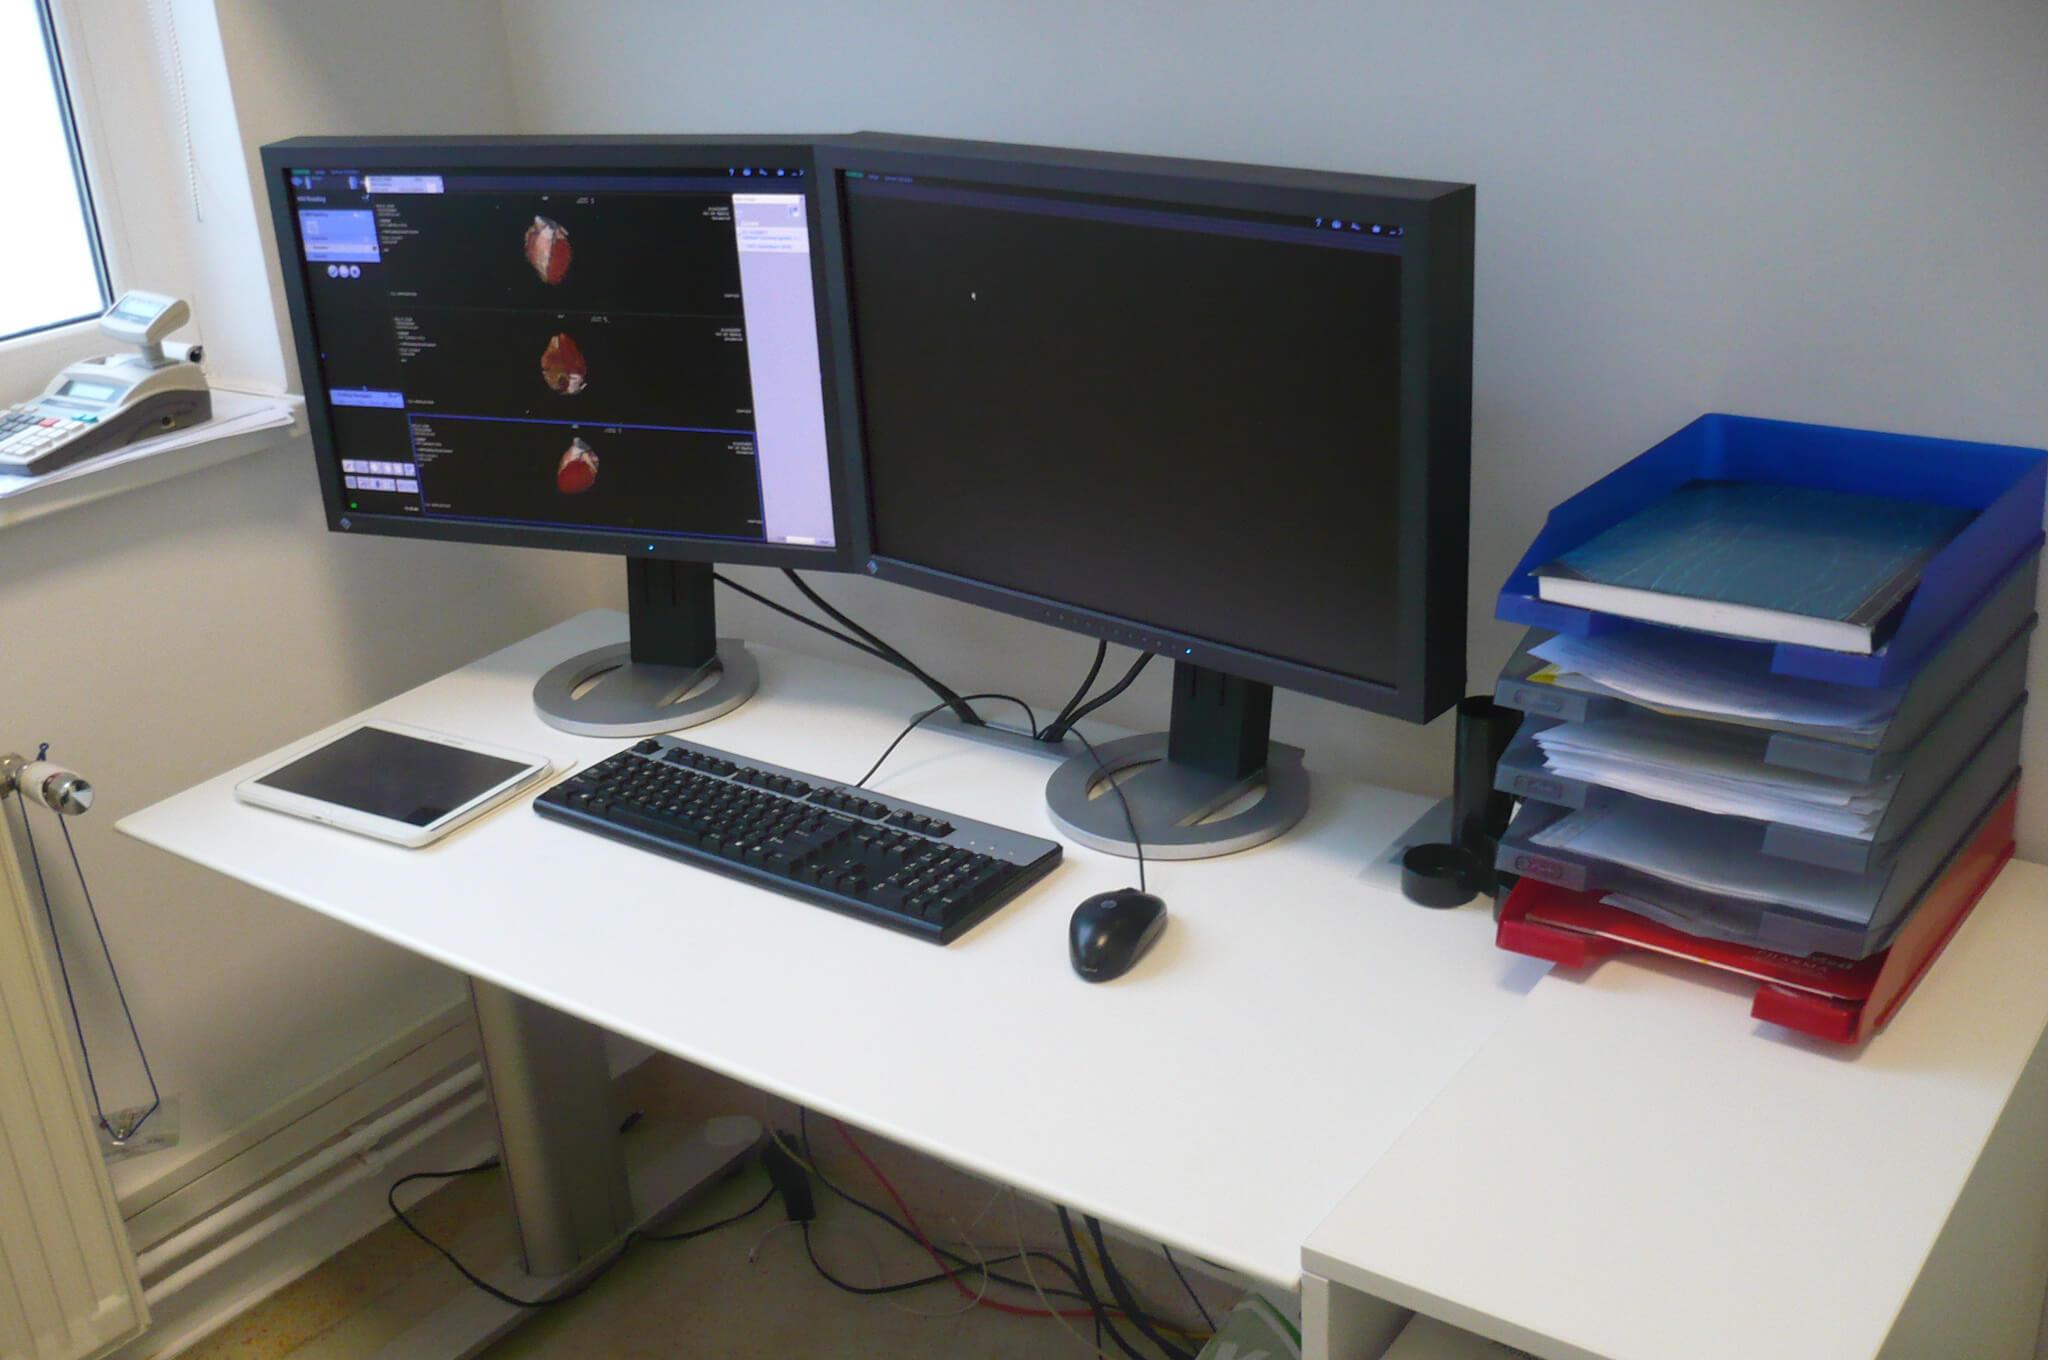 viziune și computer